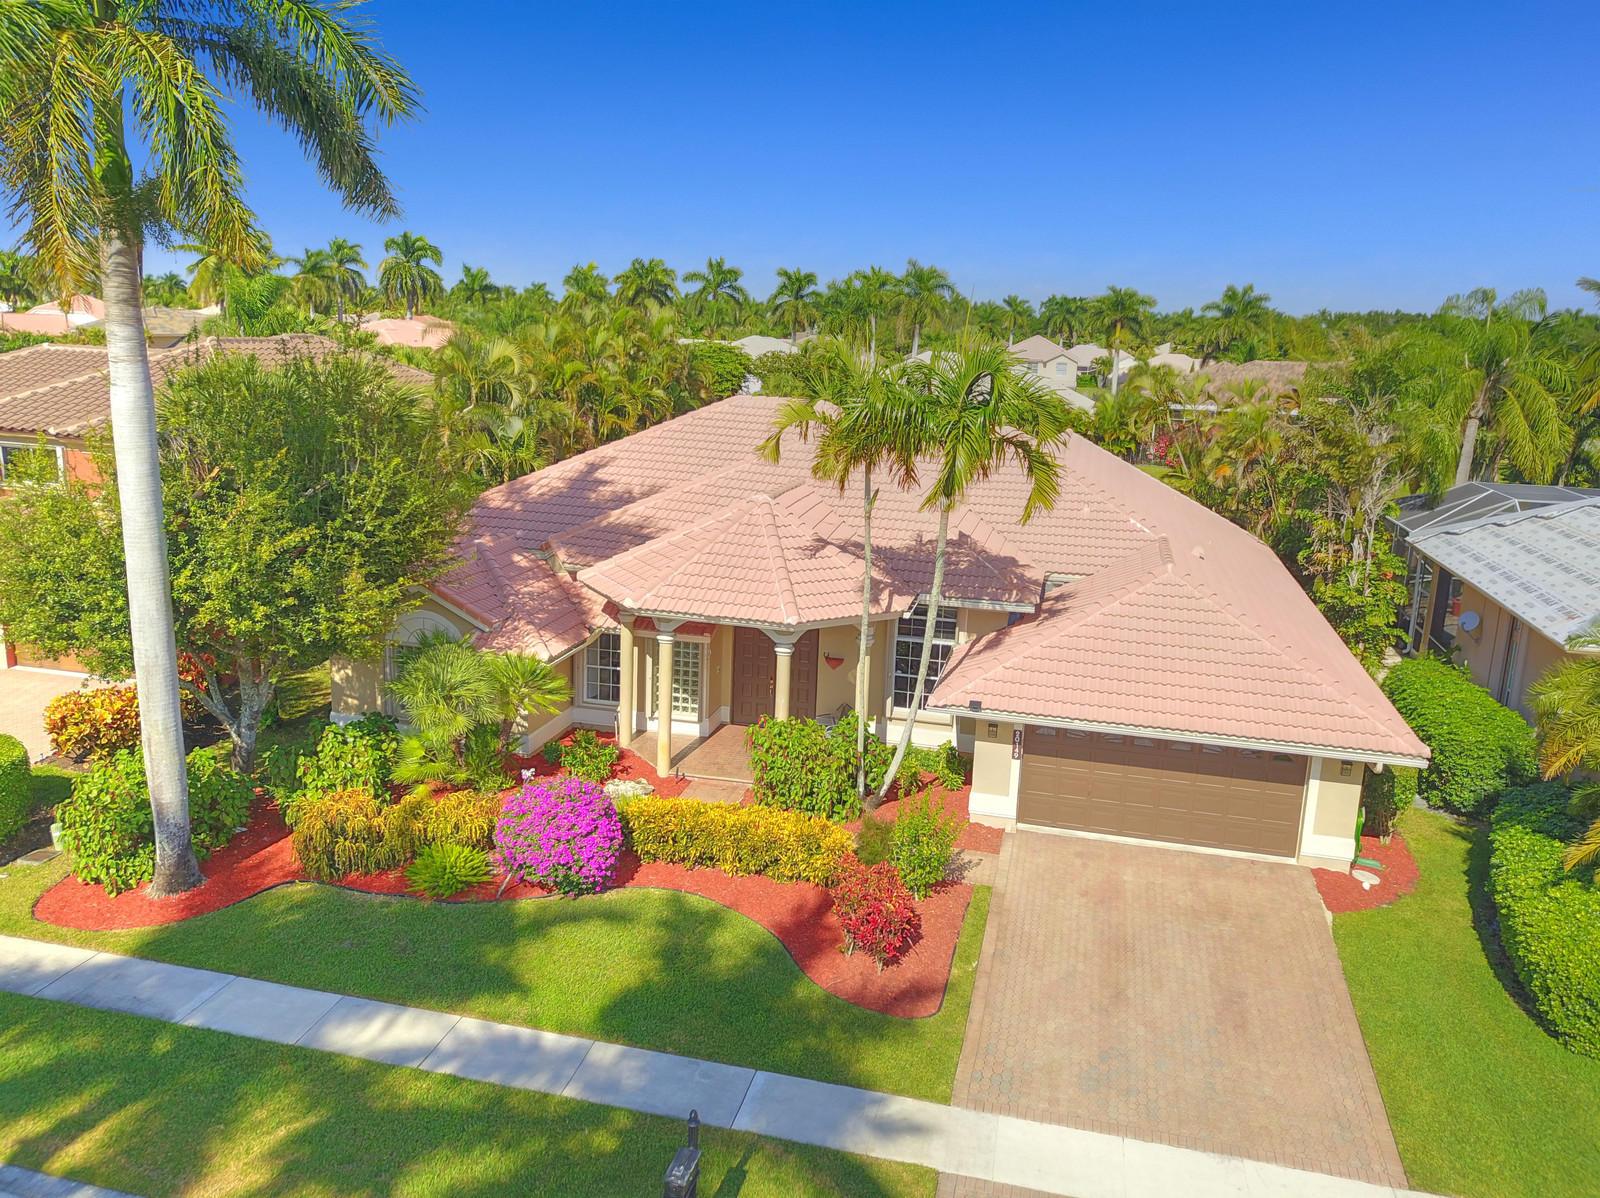 Photo of 20149 Palm Island Drive, Boca Raton, FL 33498